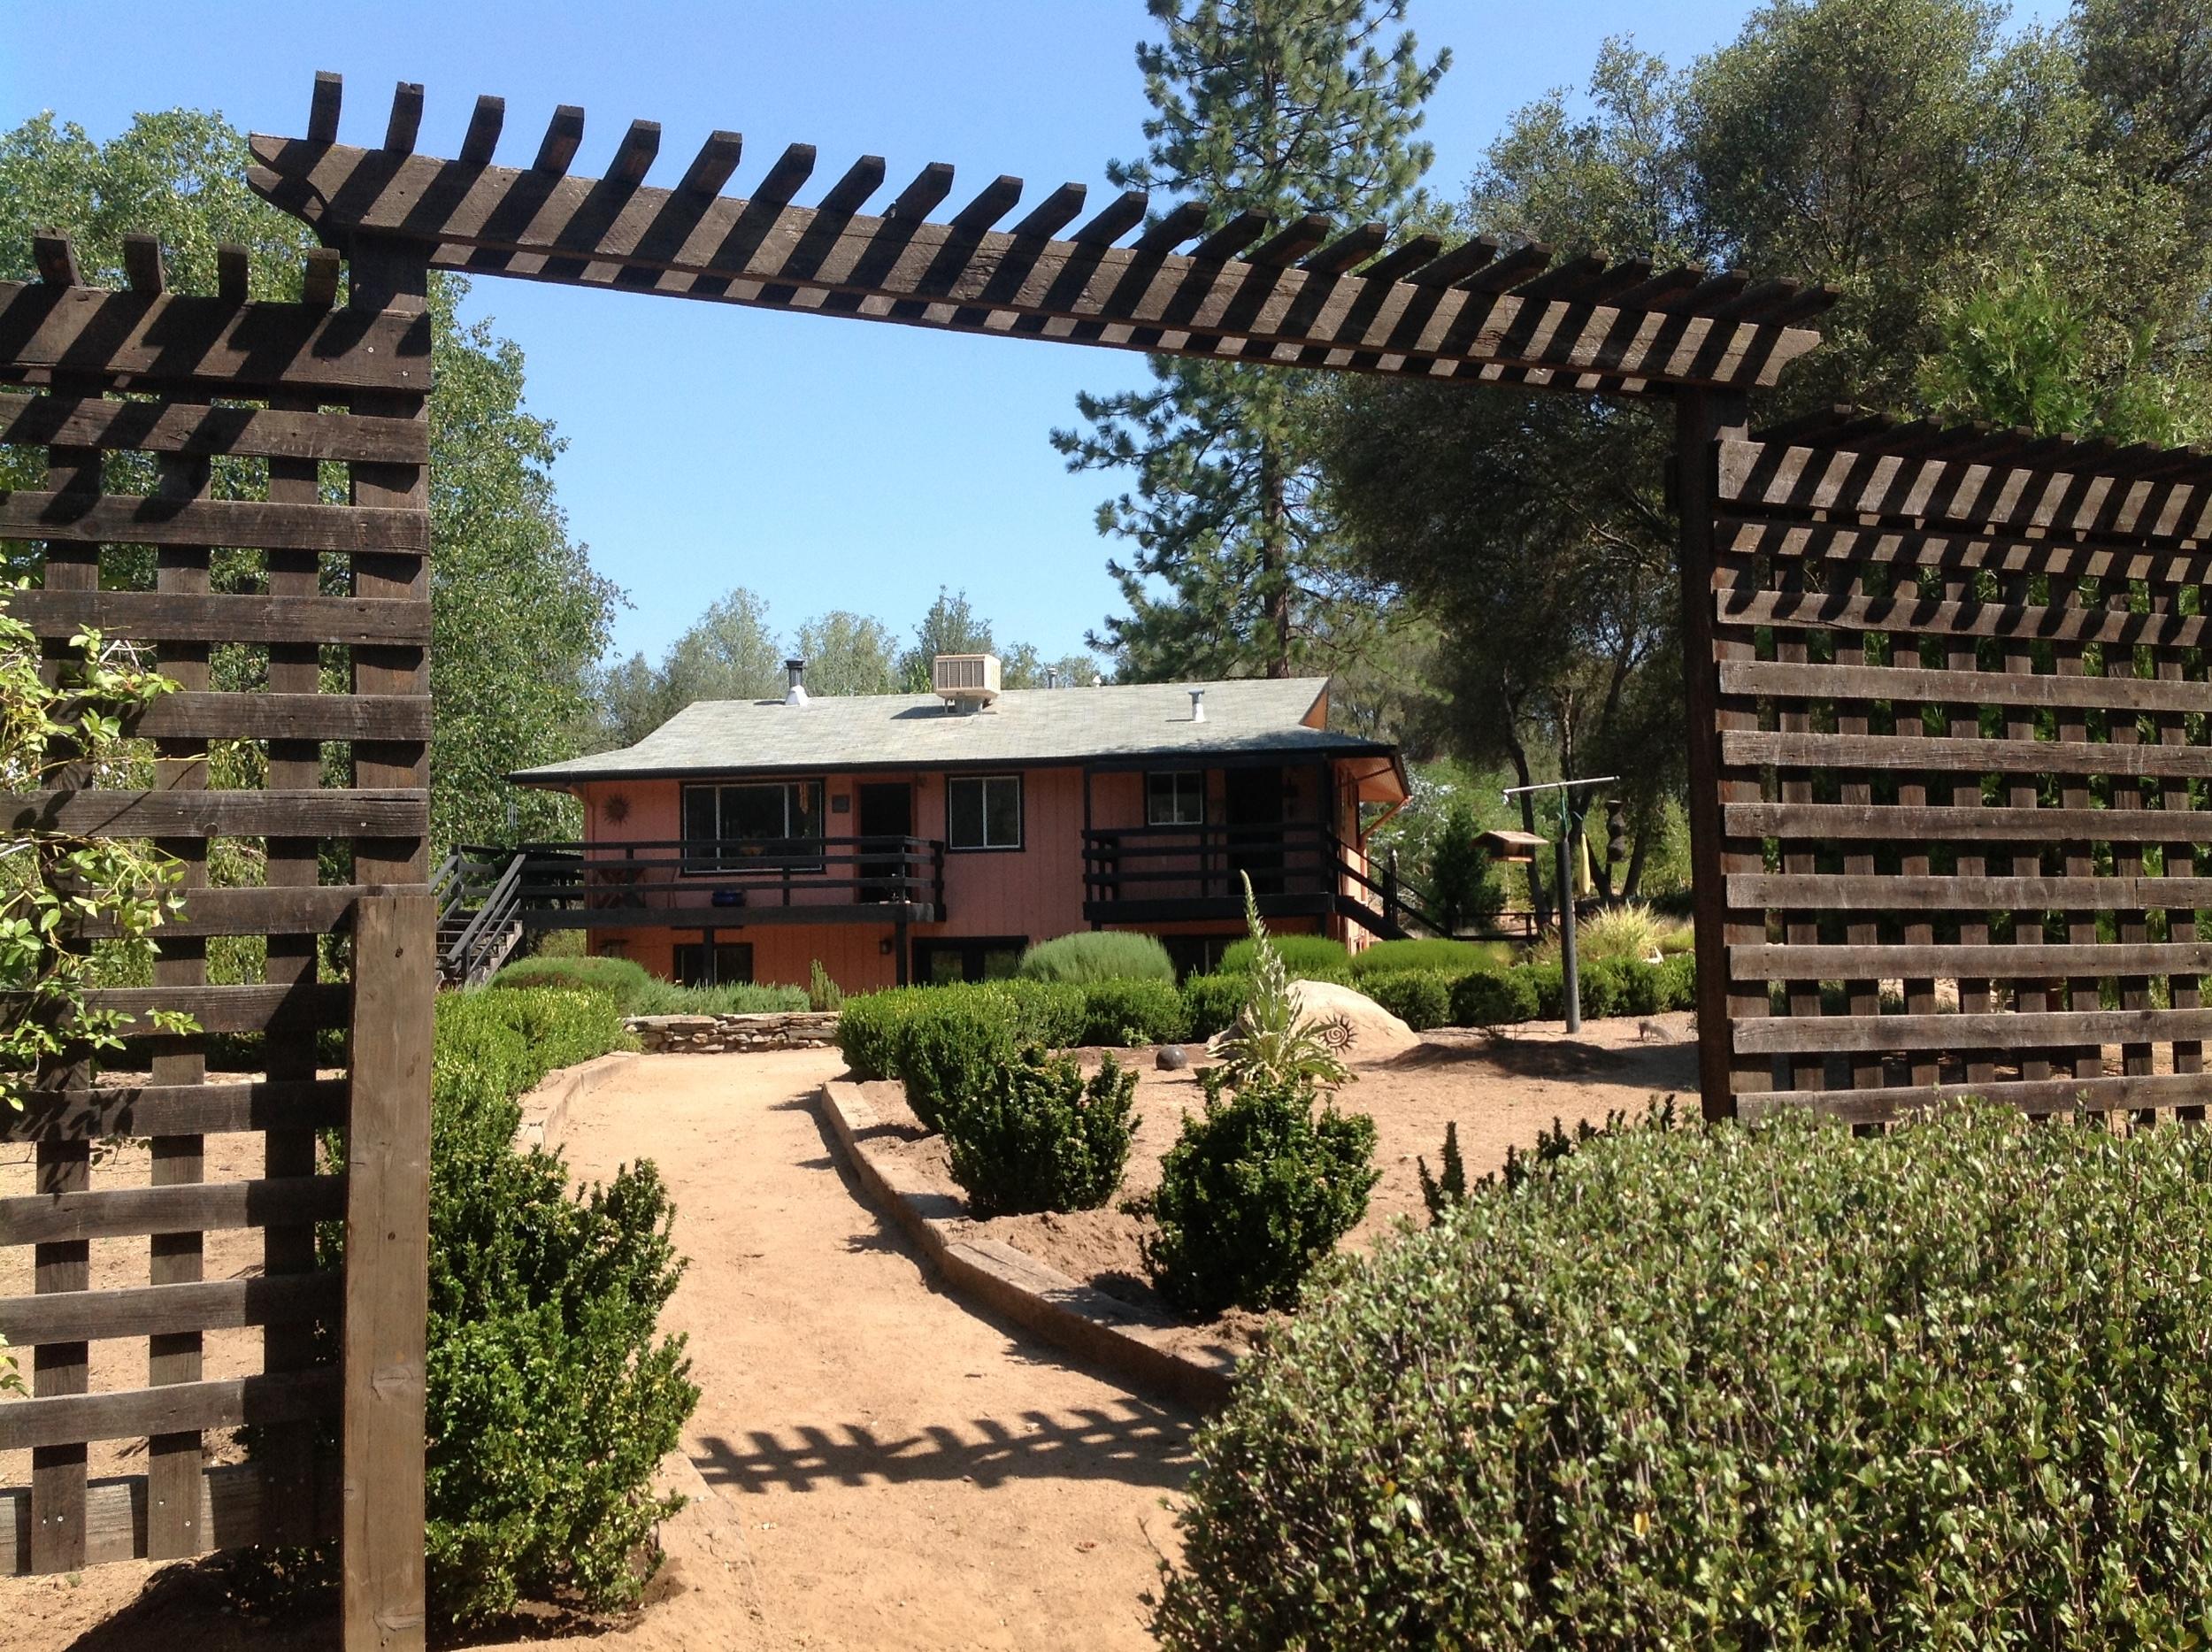 HOUSE 1 IMG_0105.JPG